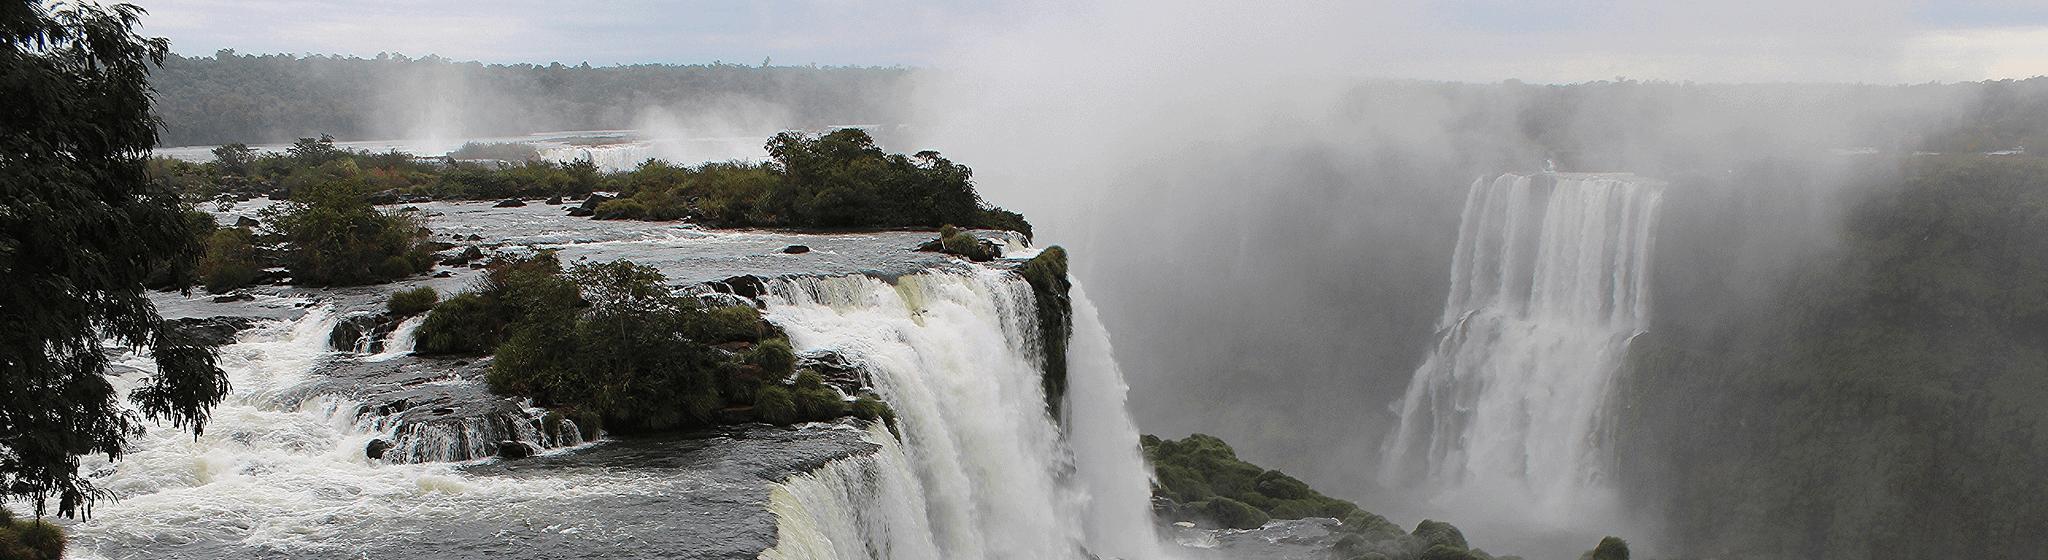 Grandes chutes d'eau naturelles.